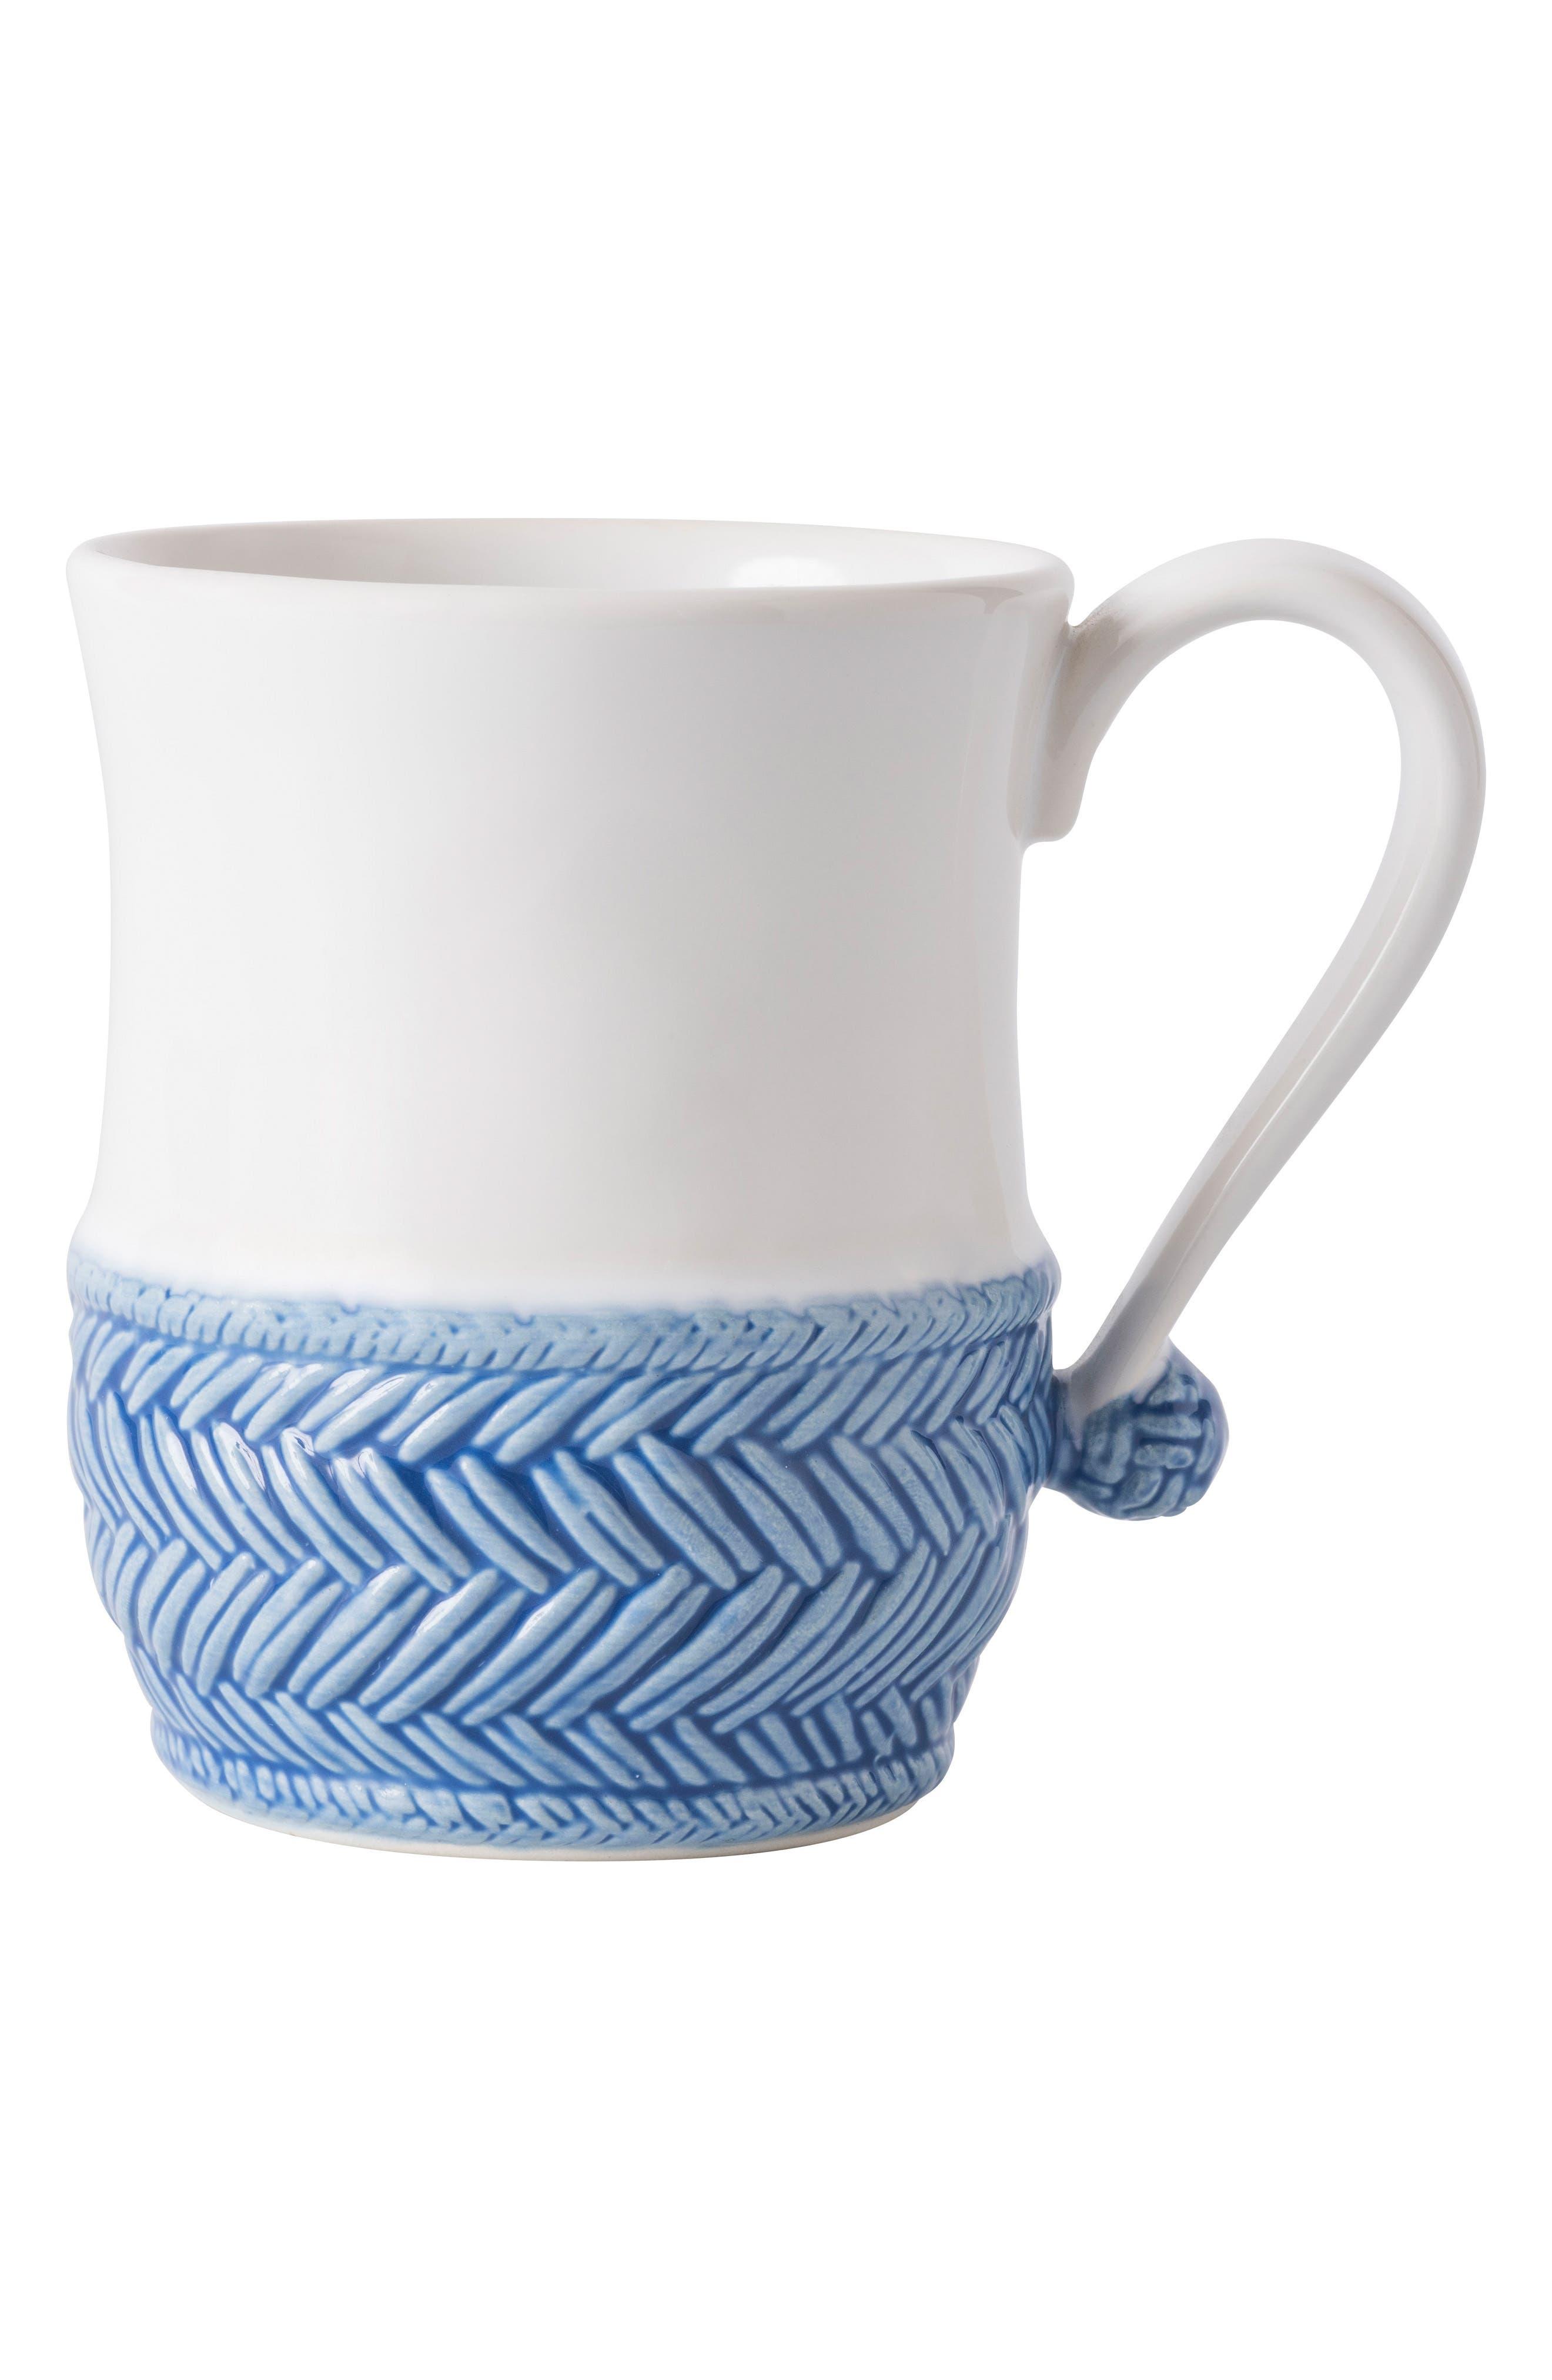 Le Panier Mug,                         Main,                         color, WHITEWASH/ DELFT BLUE